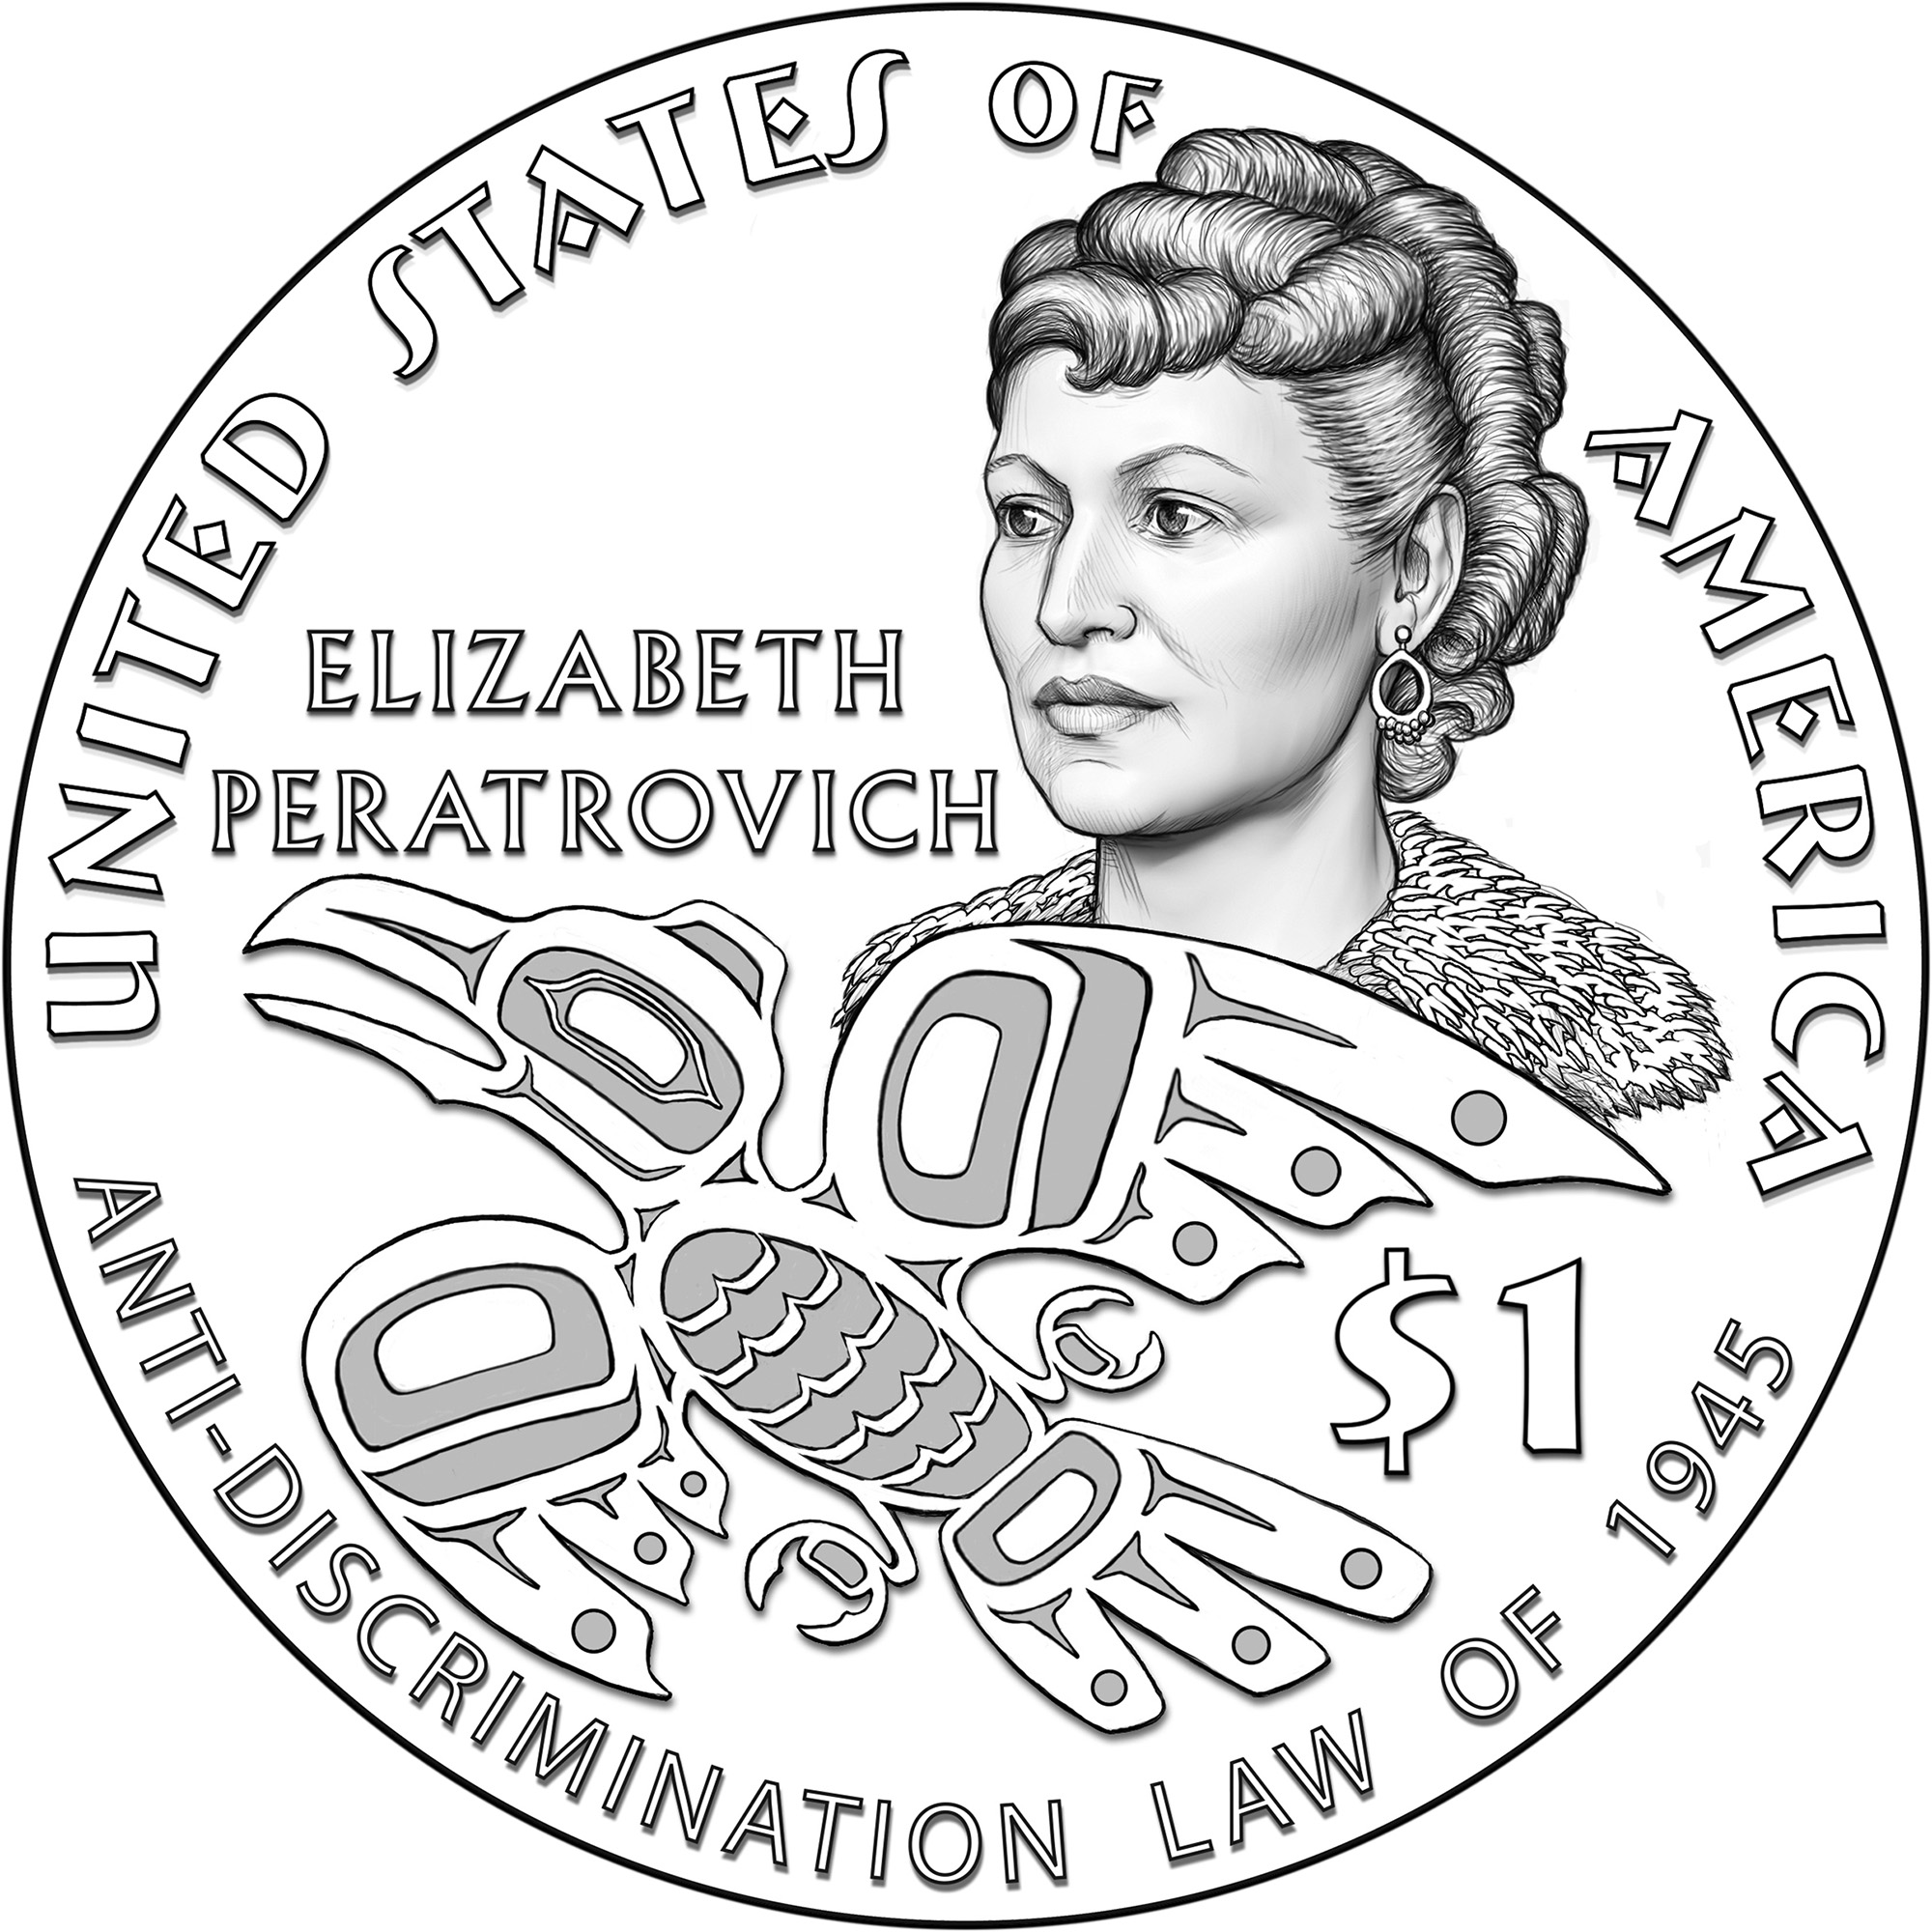 elizabeth peratrovich featured on special coin